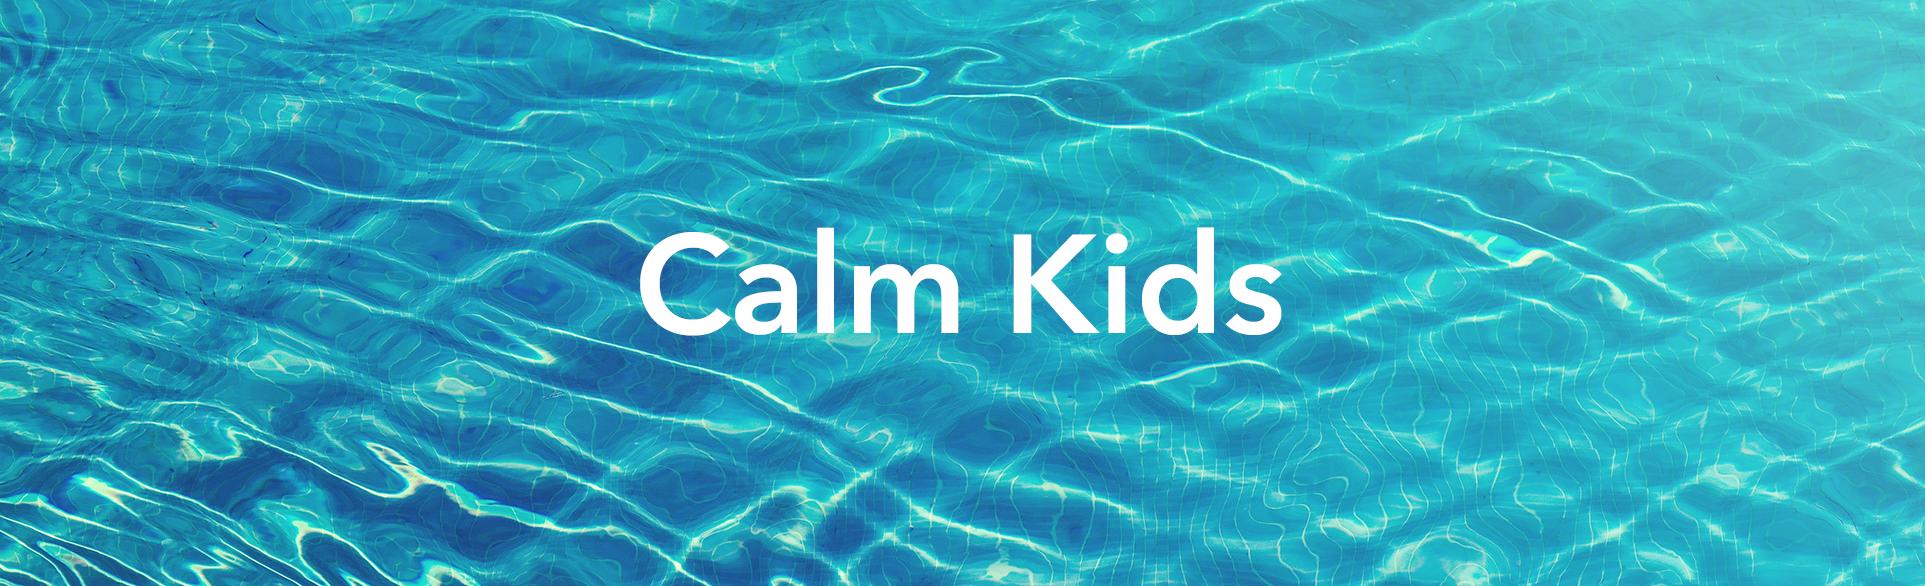 Calm Kids.png